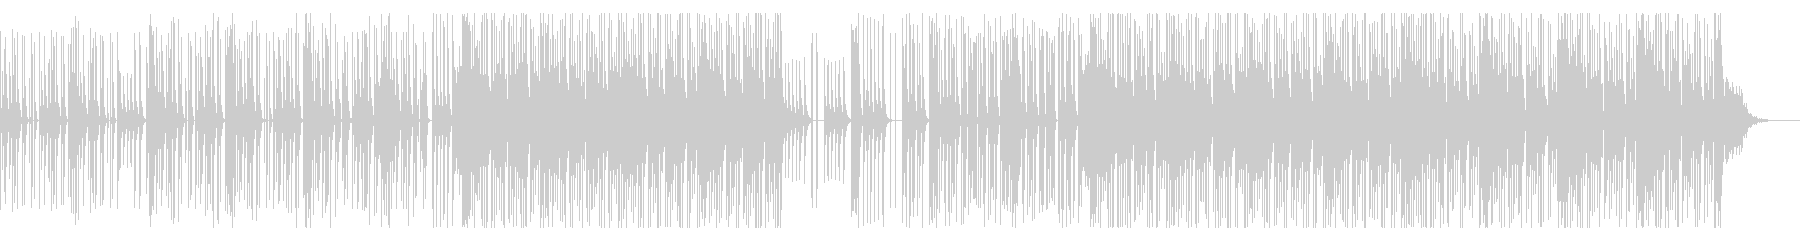 80's風テクノBGMの未再生の波形